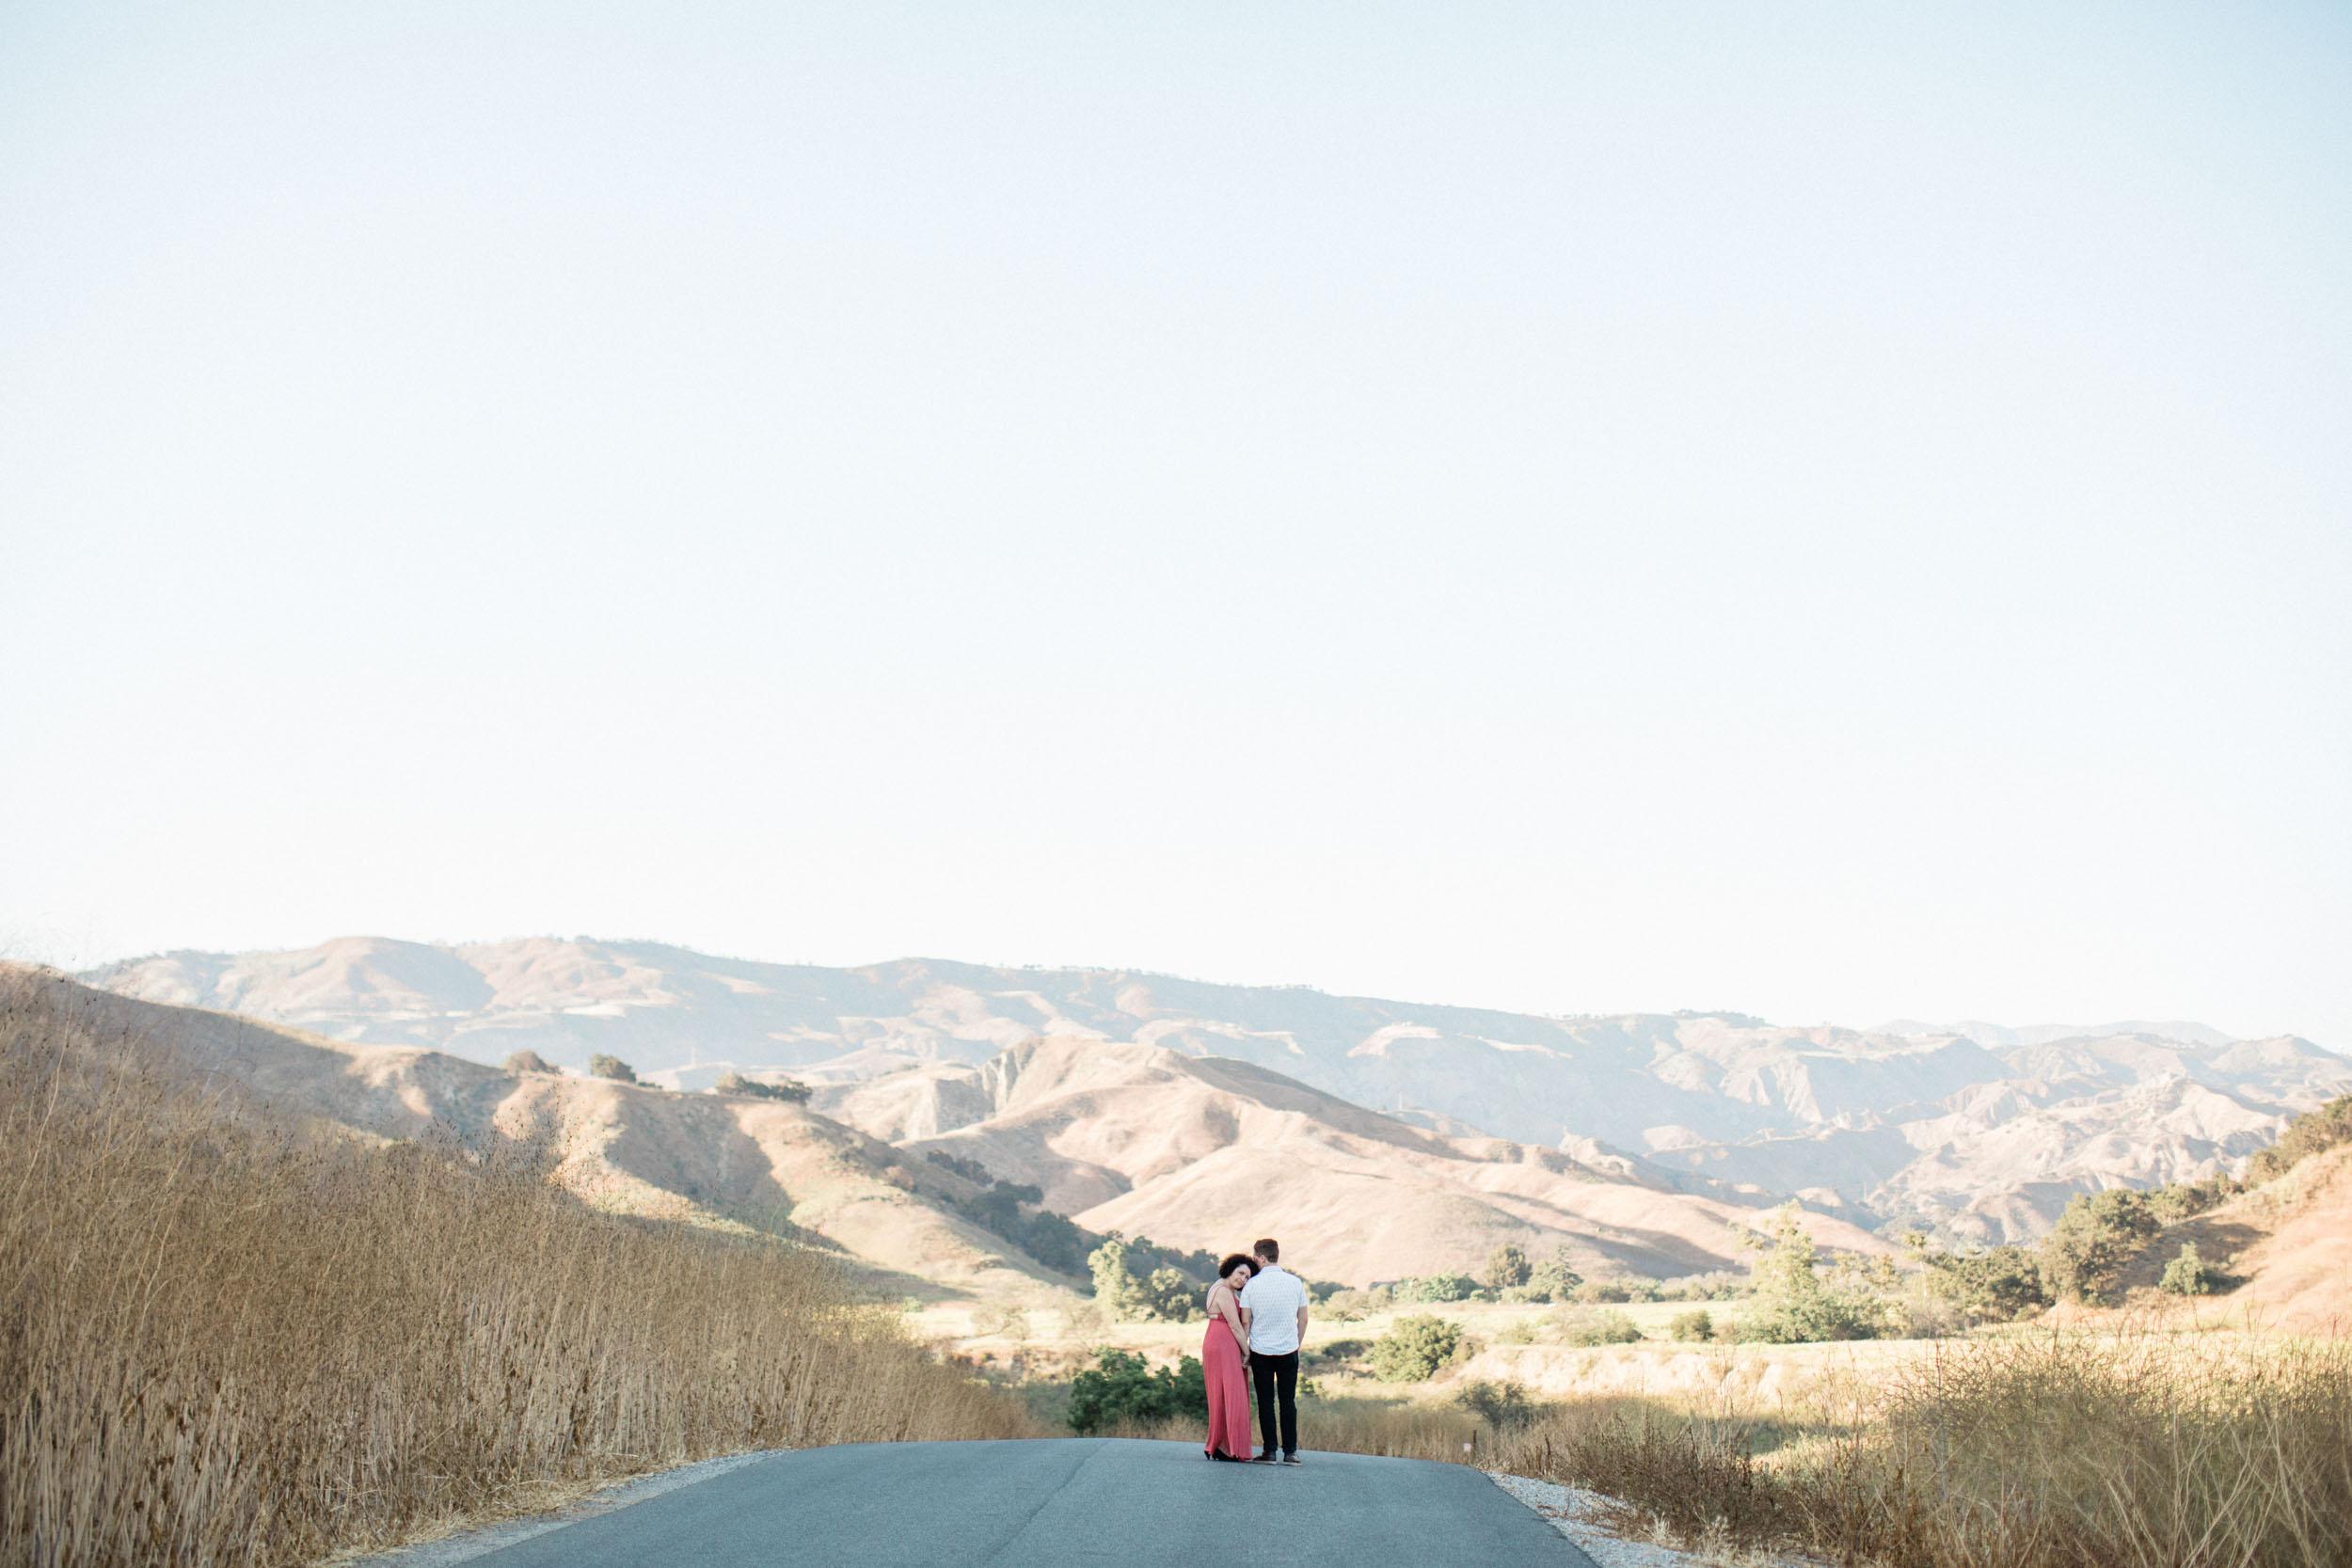 BKM-Photography-Ventura-Southern-California-Engagement-Wedding-0029.jpg